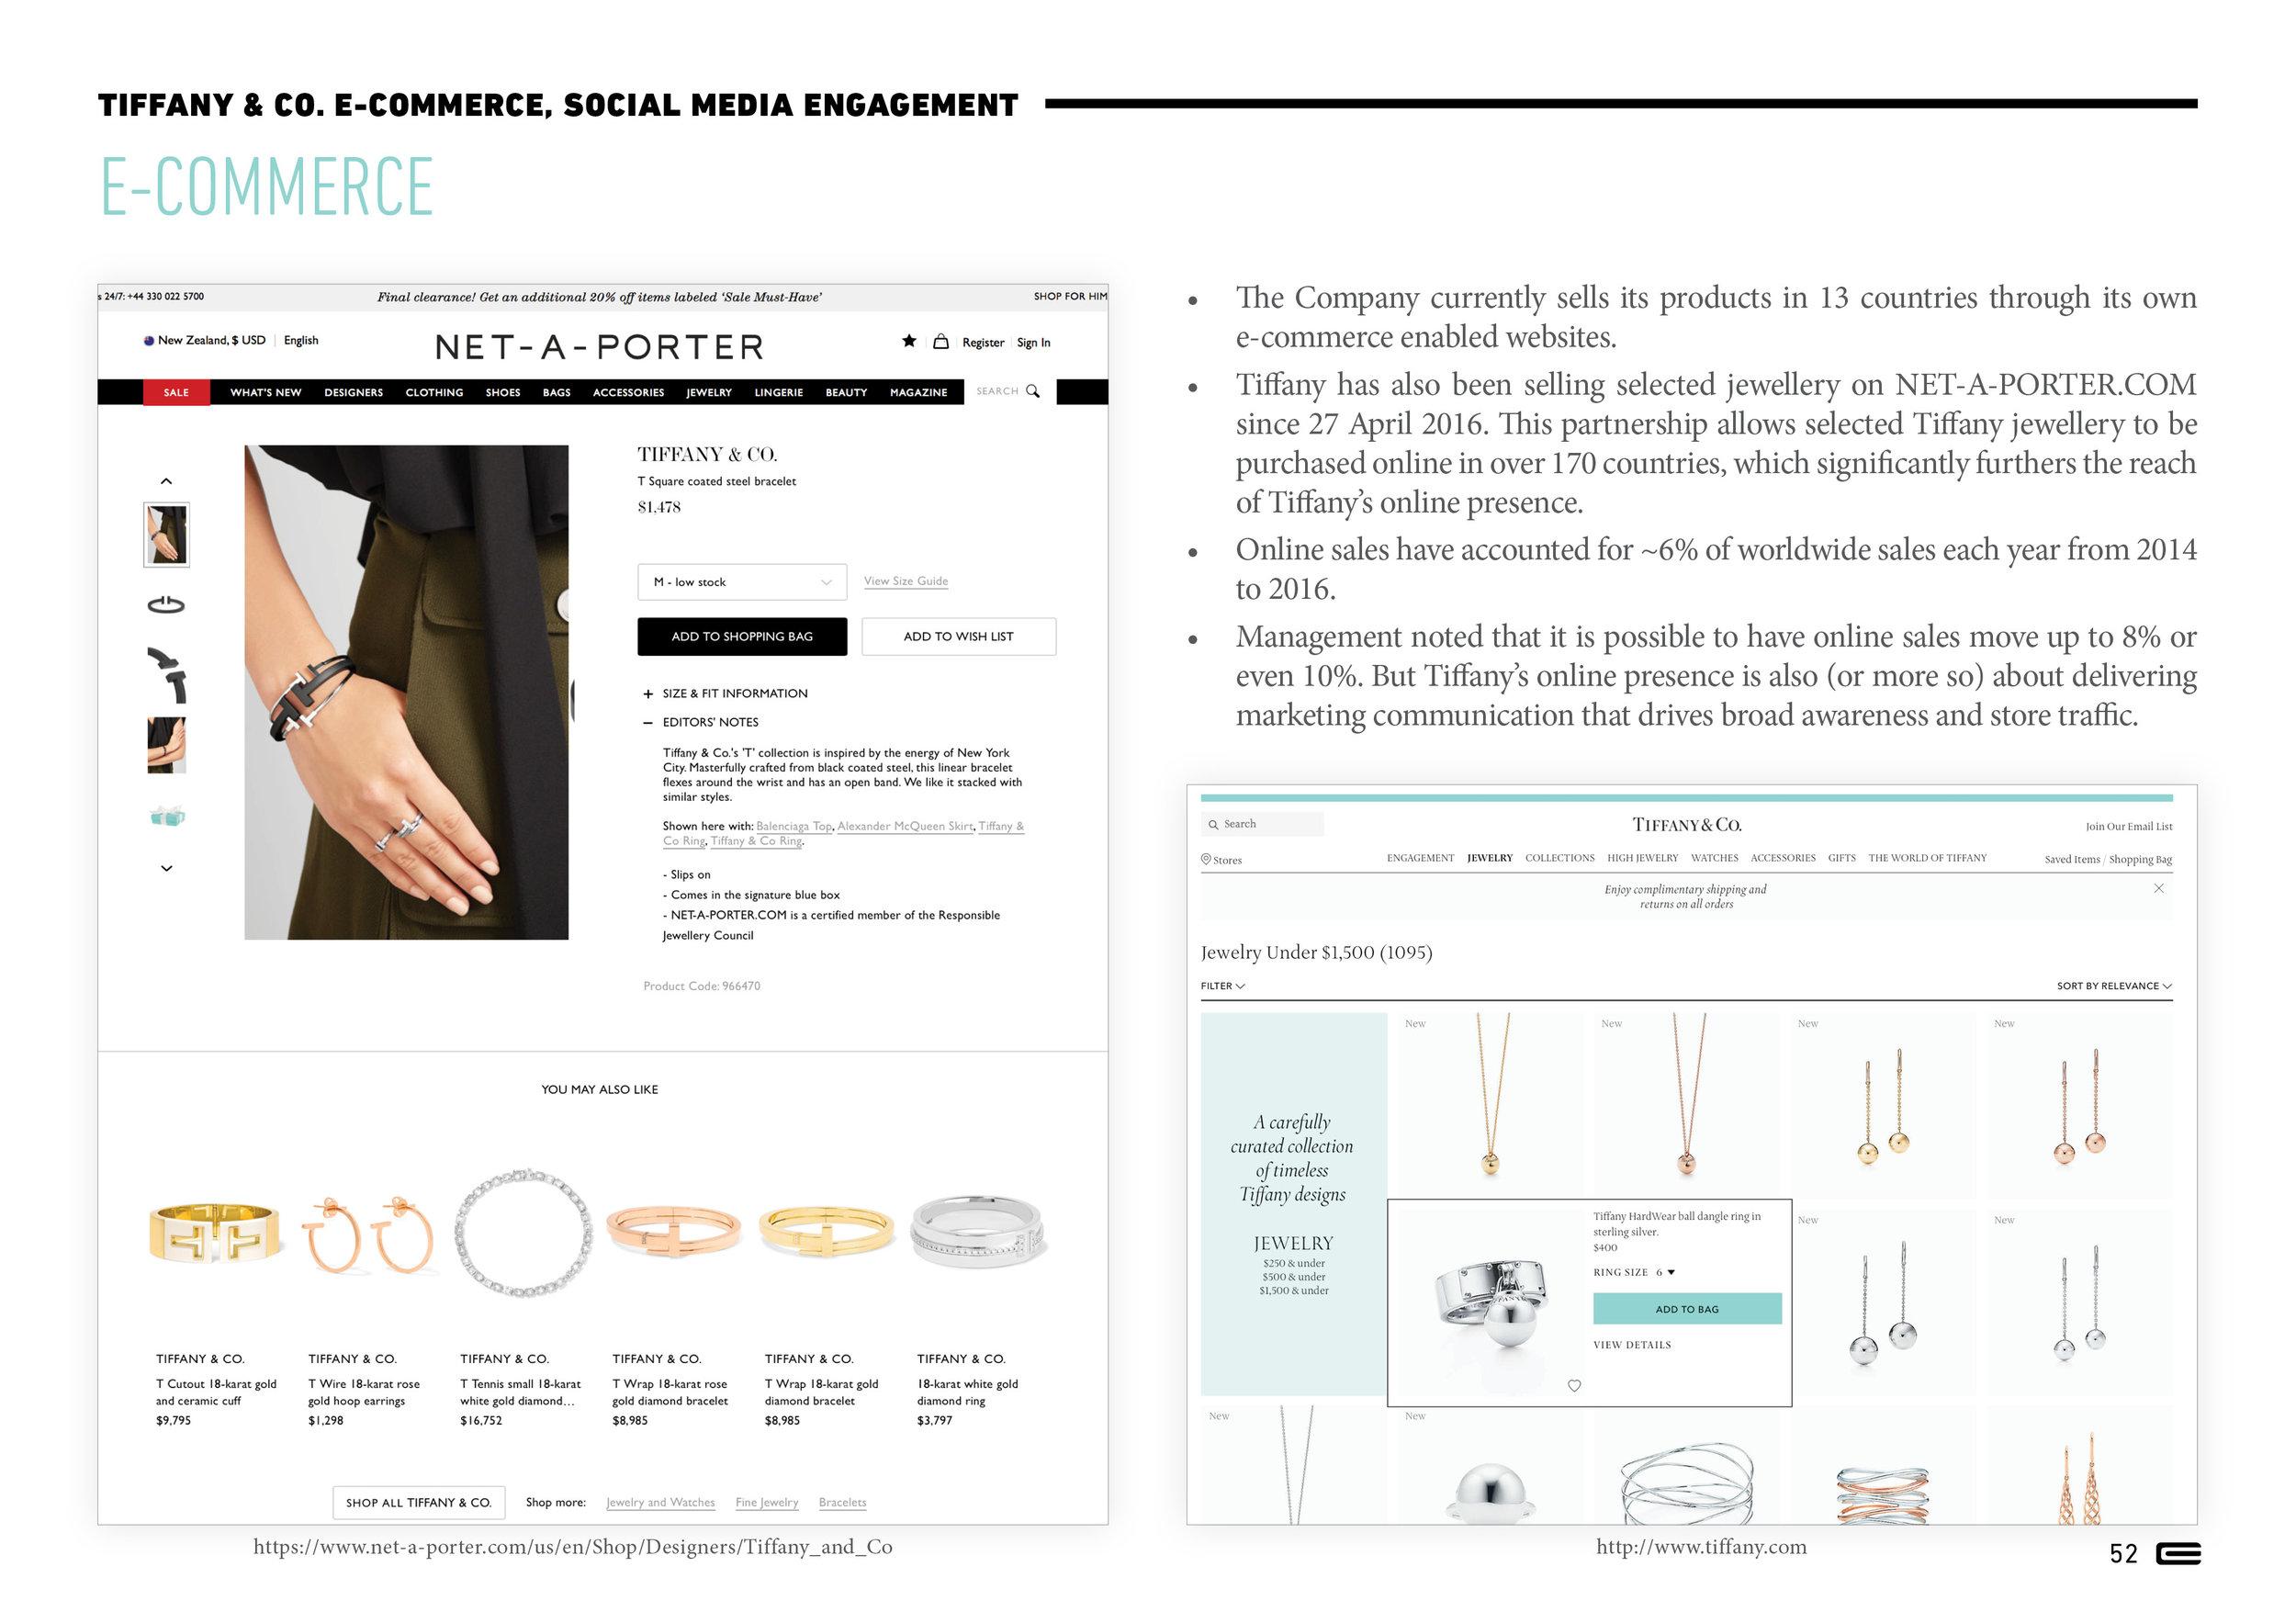 EC - VIC 2018 Presentation on Tiffany52.jpg